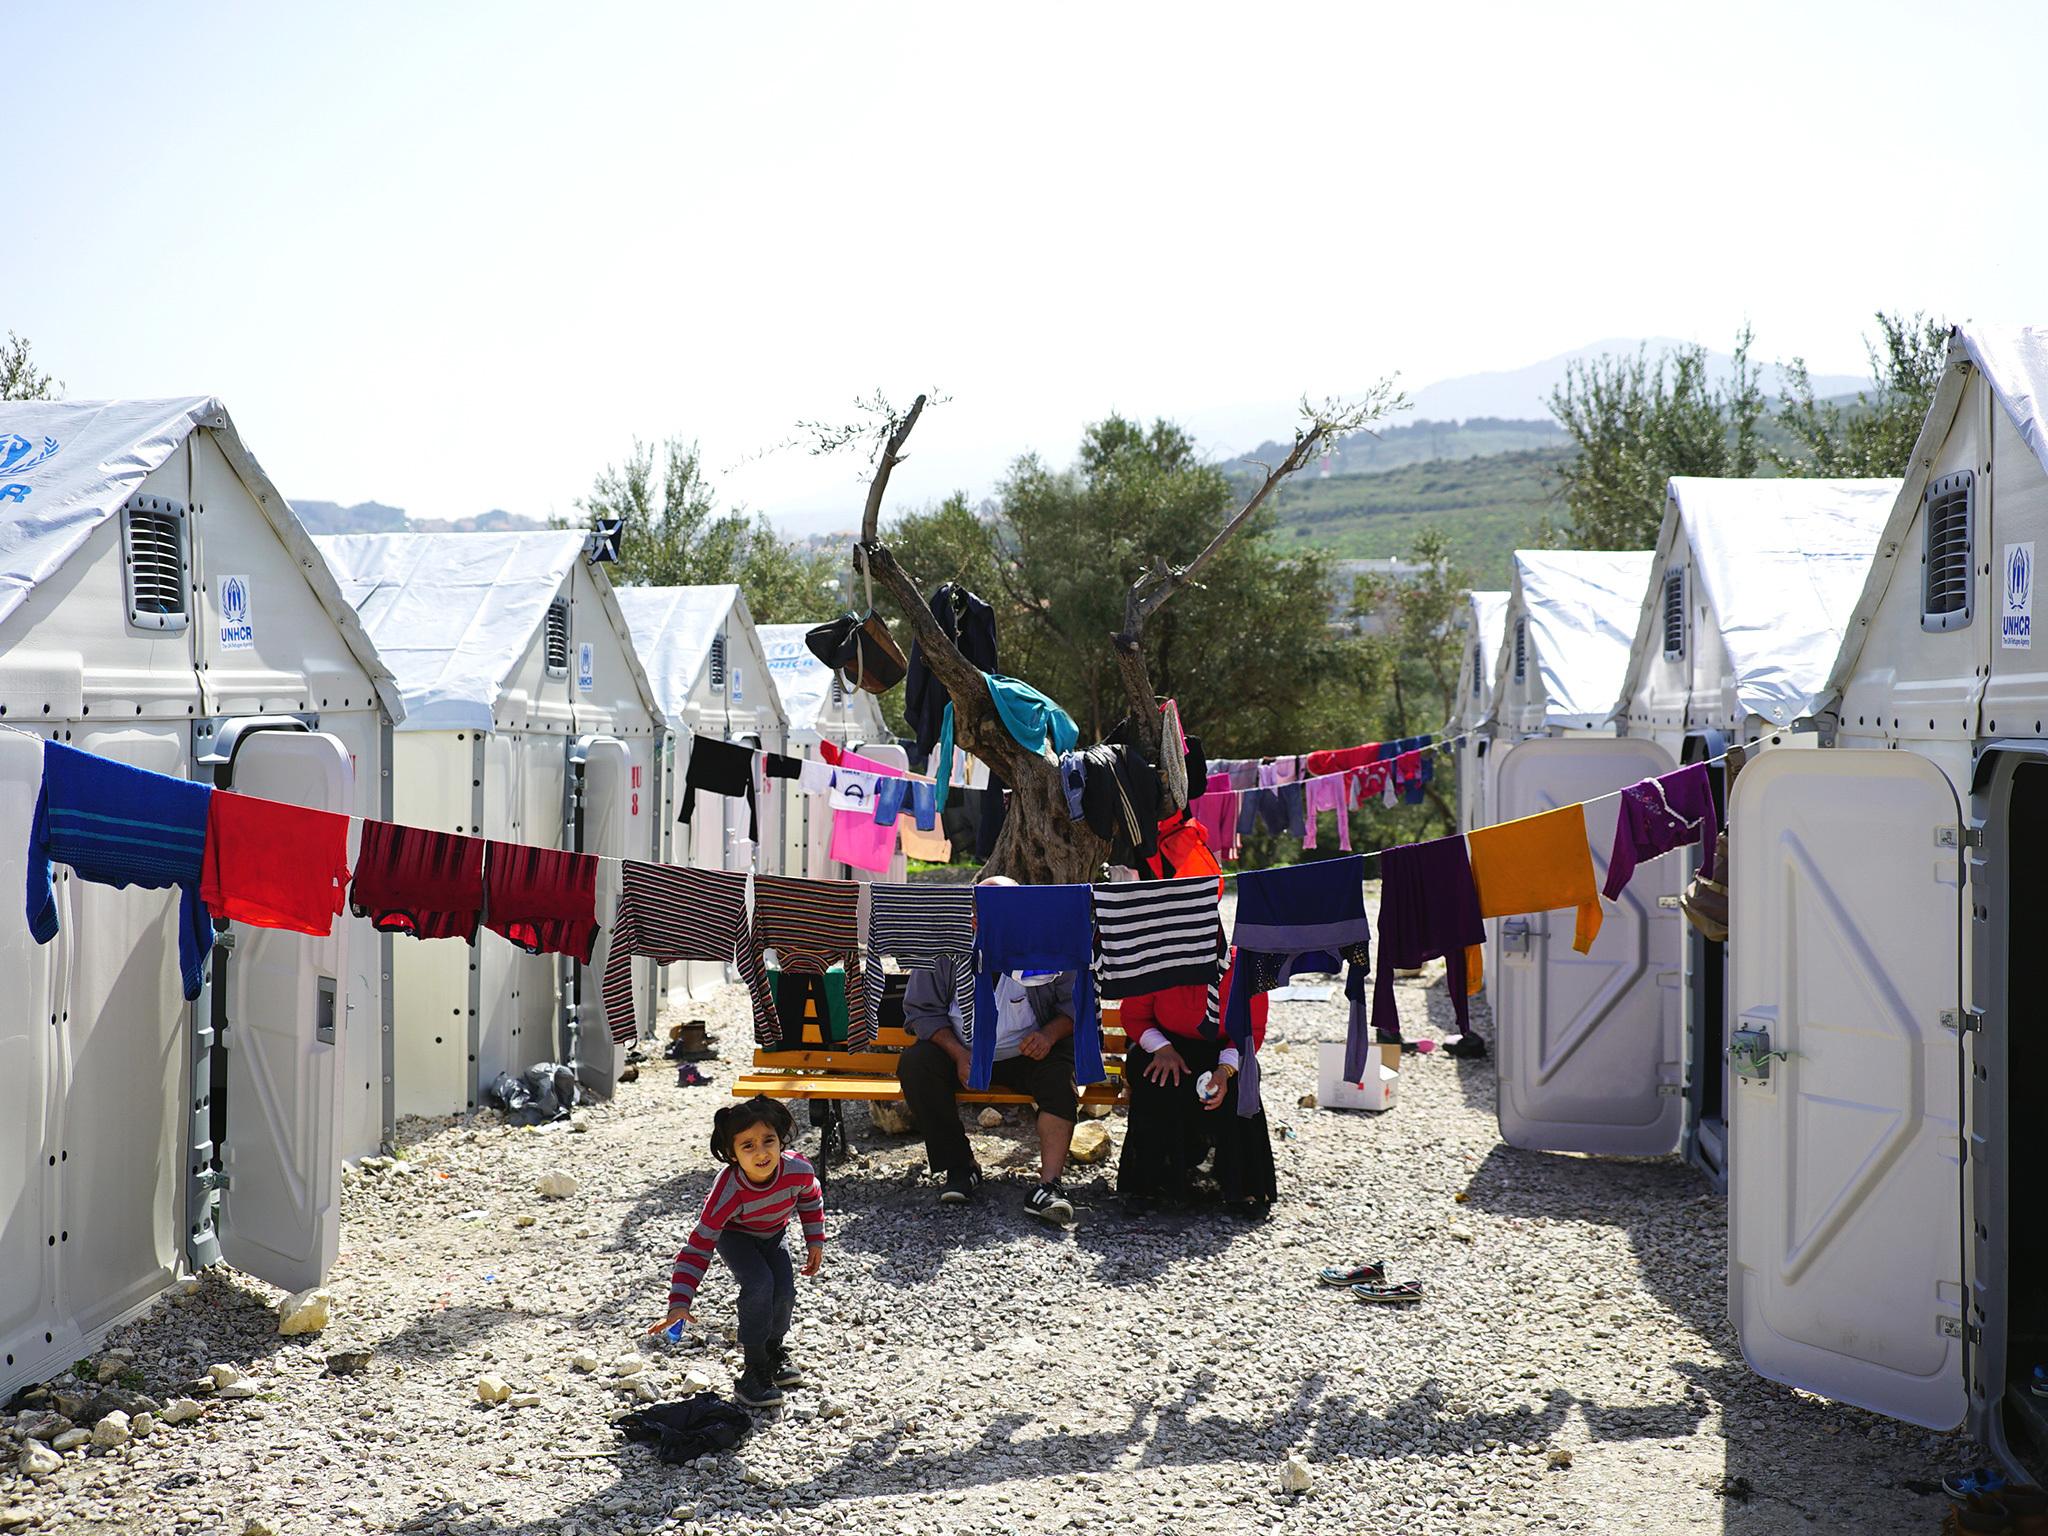 Ikea flatpack refugee centre - Design Museum